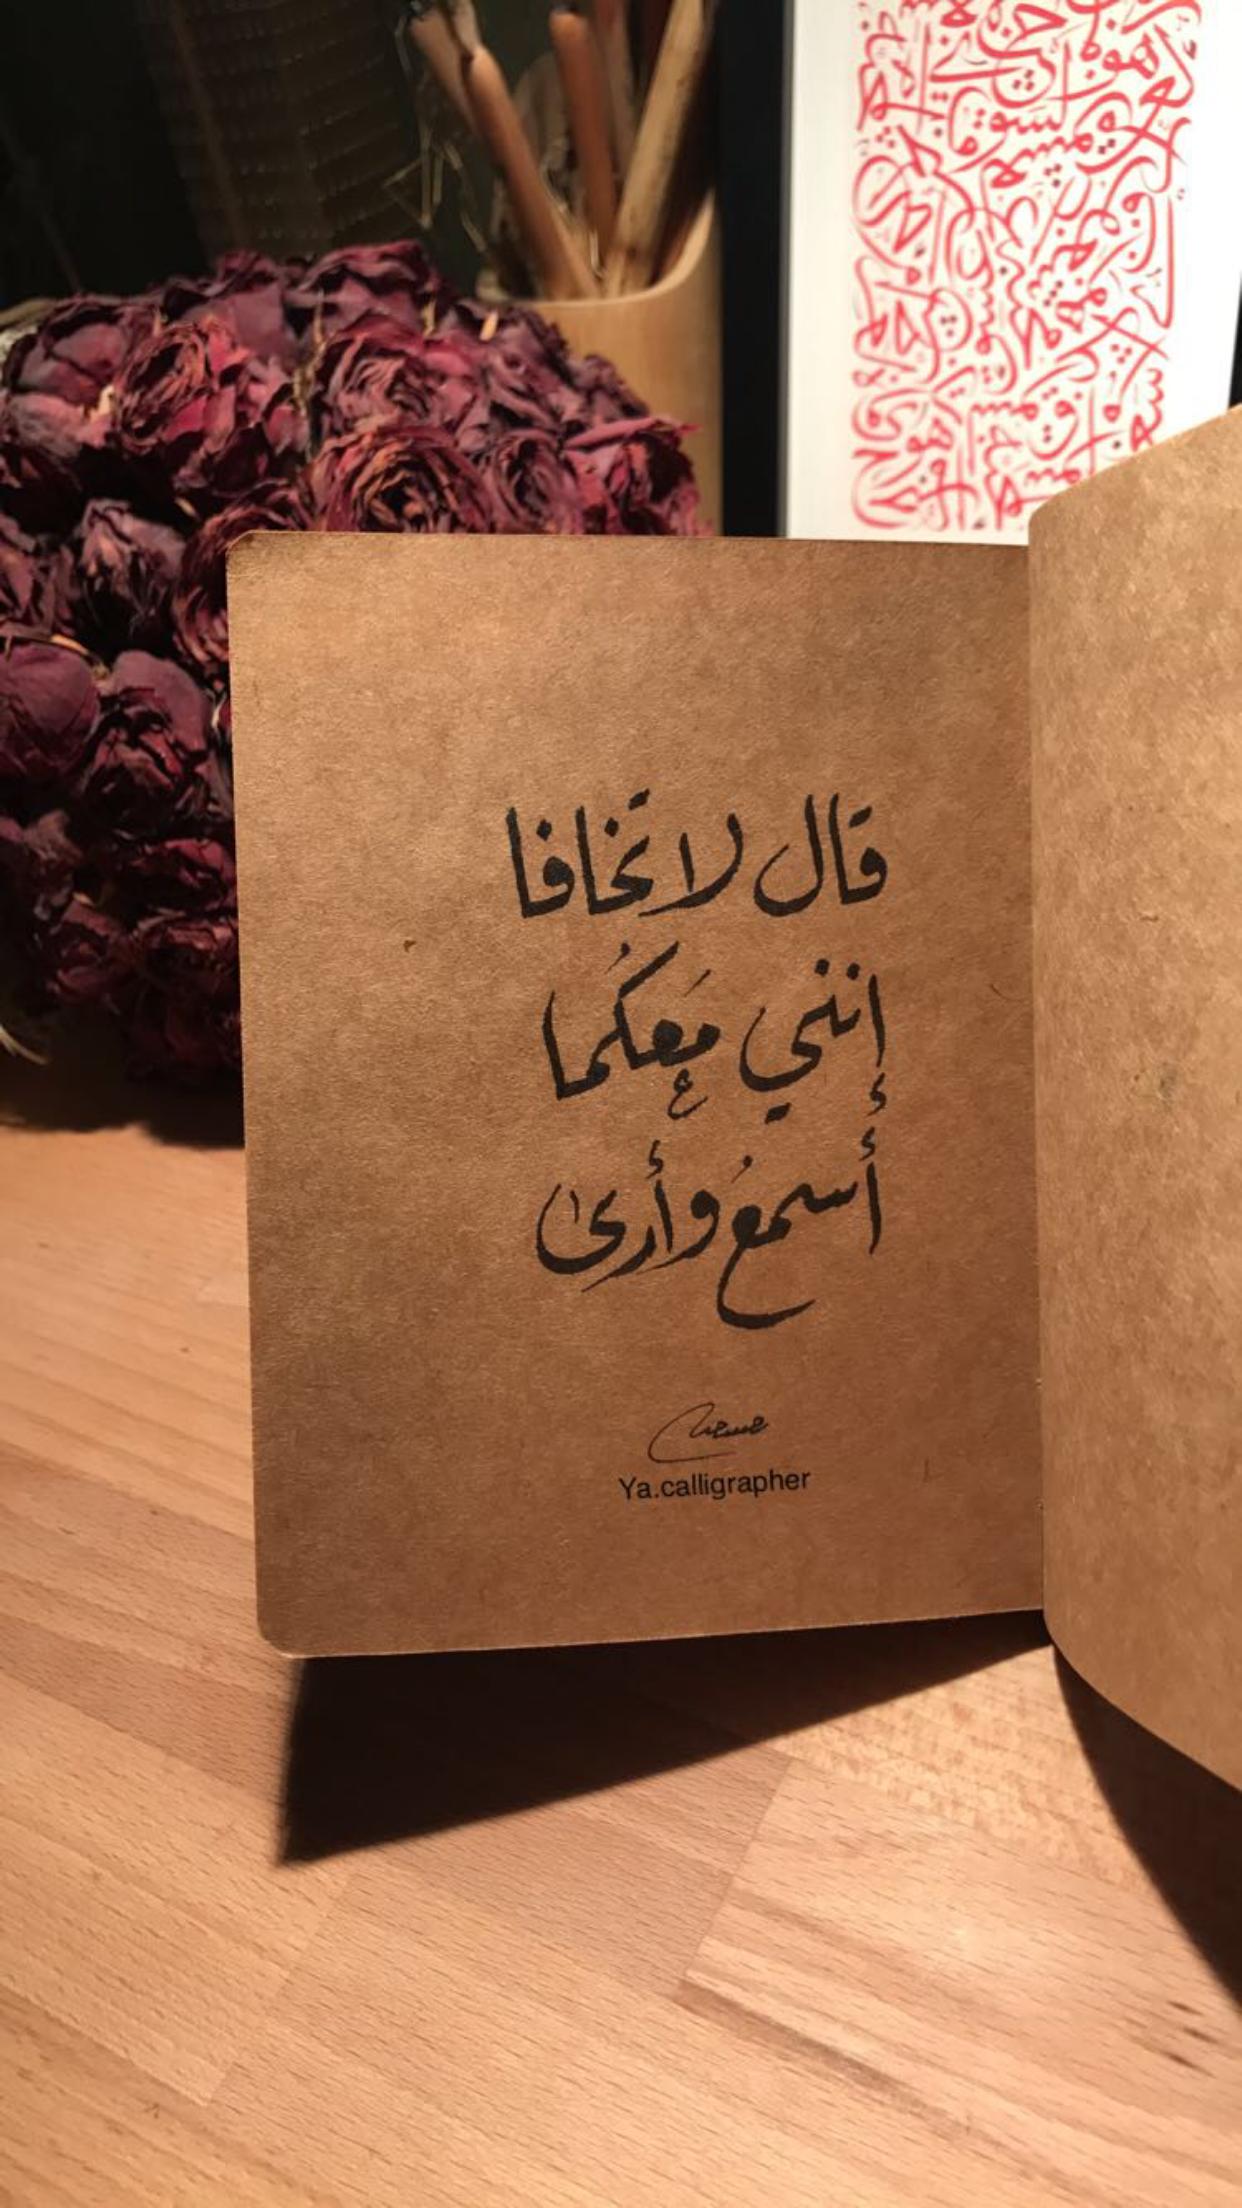 قال لا تخافا إنني معكما أسمع وأرى خط Beautiful Arabic Words Soul Quotes Calligraphy Quotes